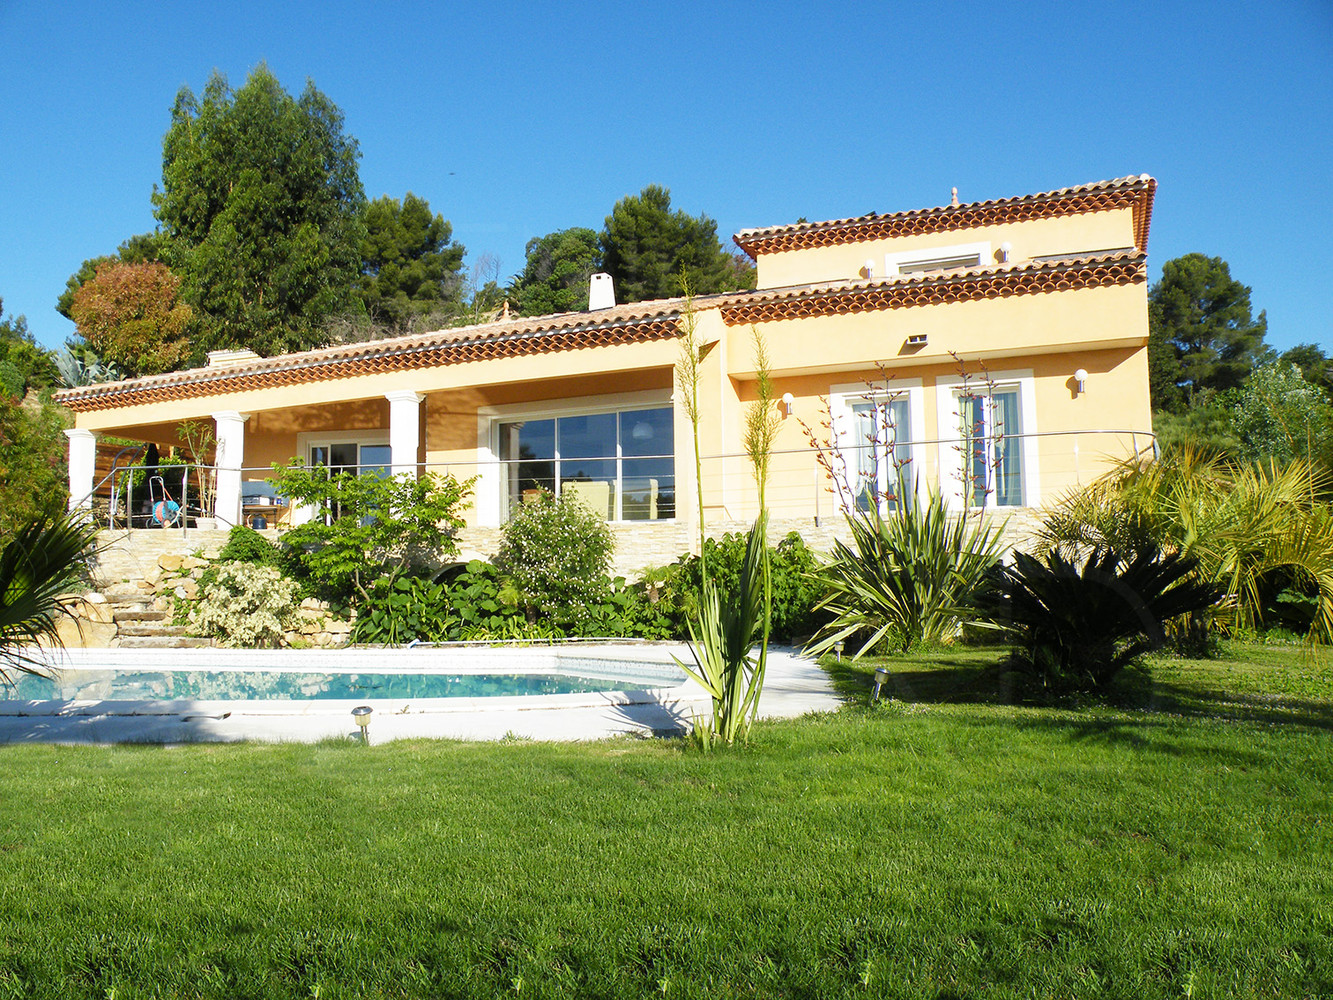 villa a vendre carqueiranne piscine sud est 3 chambres quartier r sidentiel. Black Bedroom Furniture Sets. Home Design Ideas